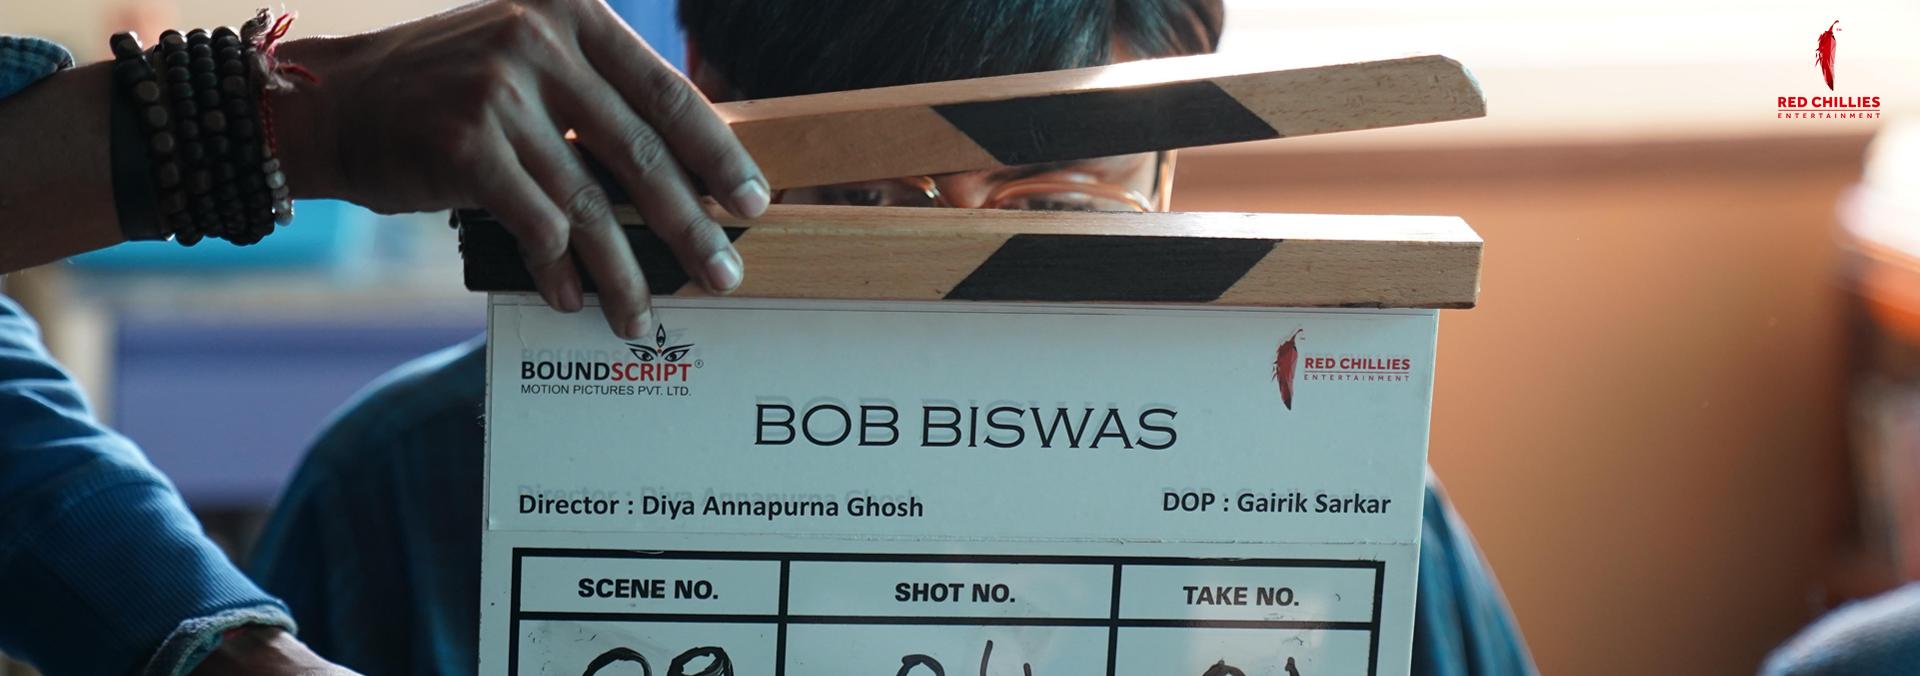 Bob Biswas 1